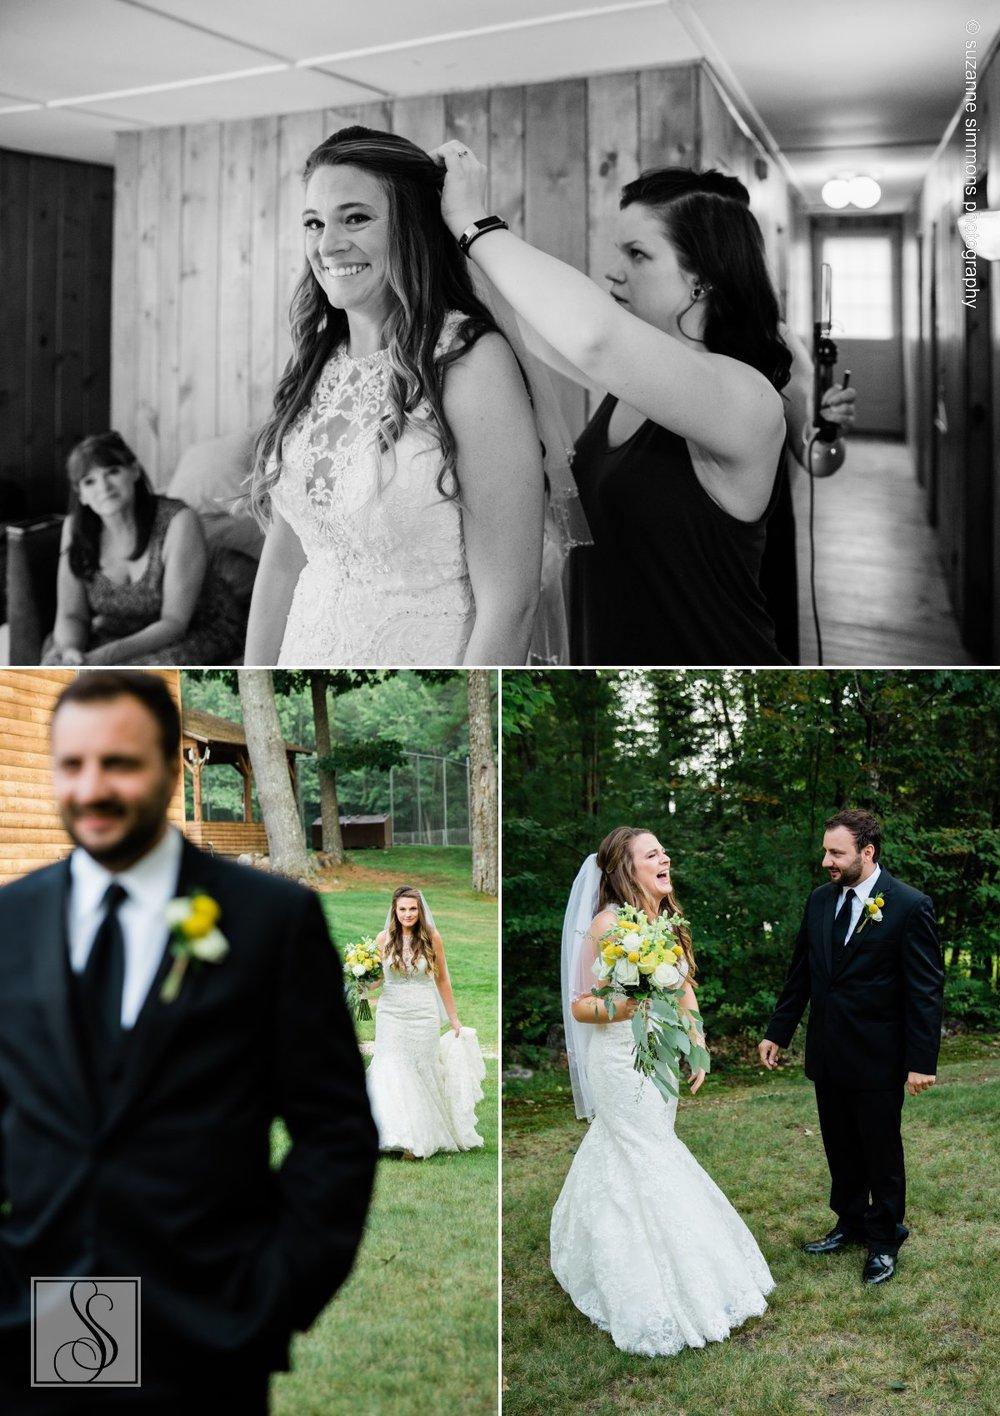 Wedding preparations at Camp Wildwood